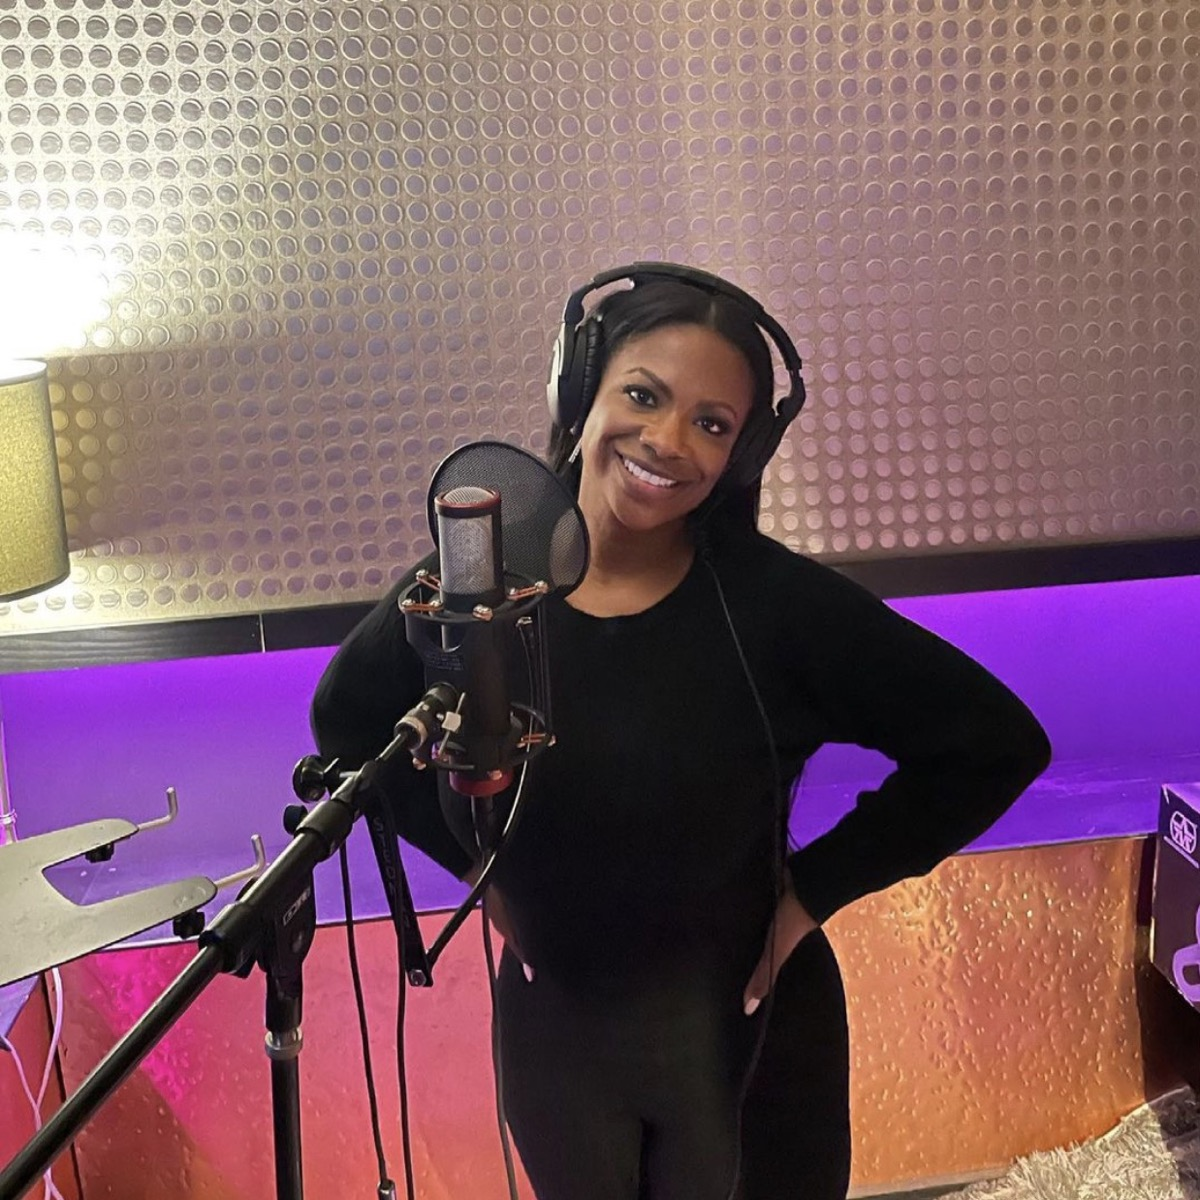 kandi burruss in black outfit in recording studio